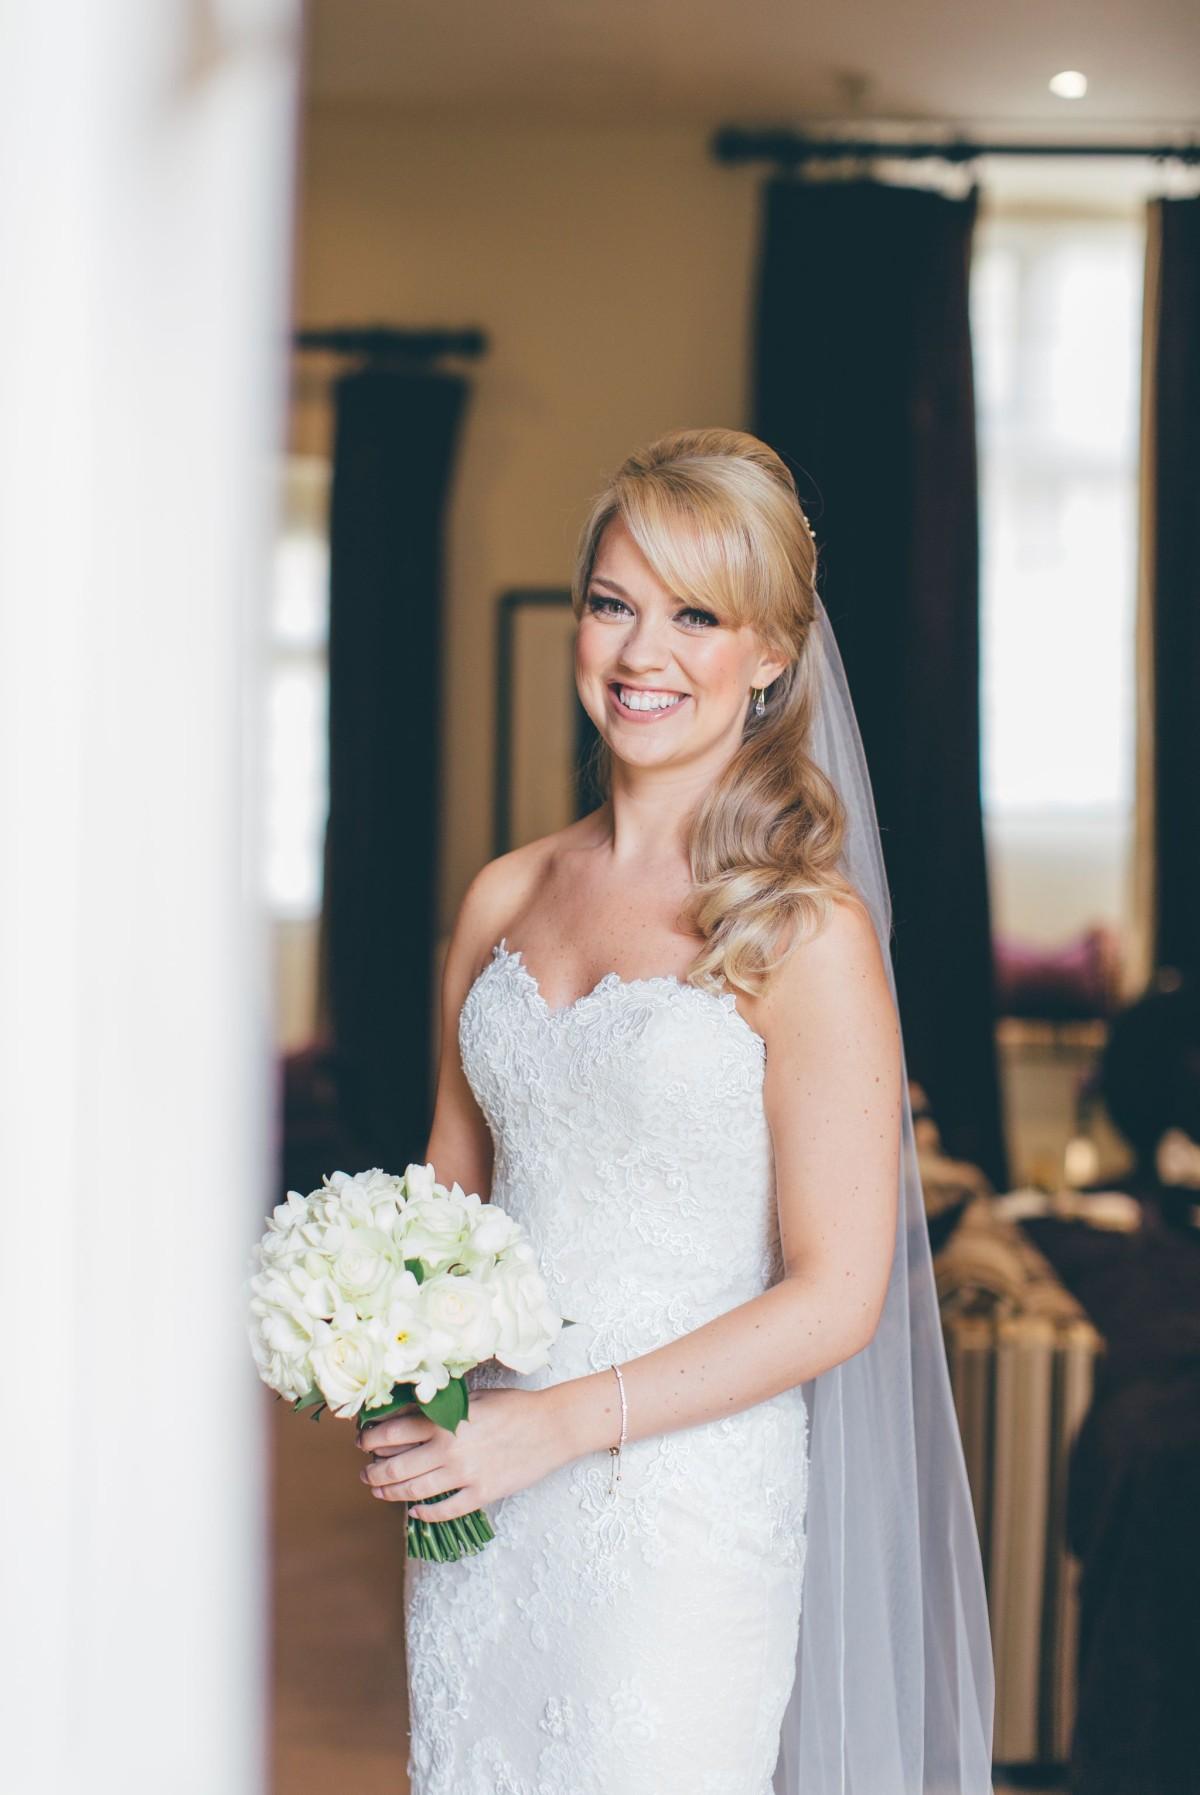 welsh_wedding_photographer_rachel_lambert_photography_lower_slaughter_manor_house_cotswolds_harriet_dean_ 13